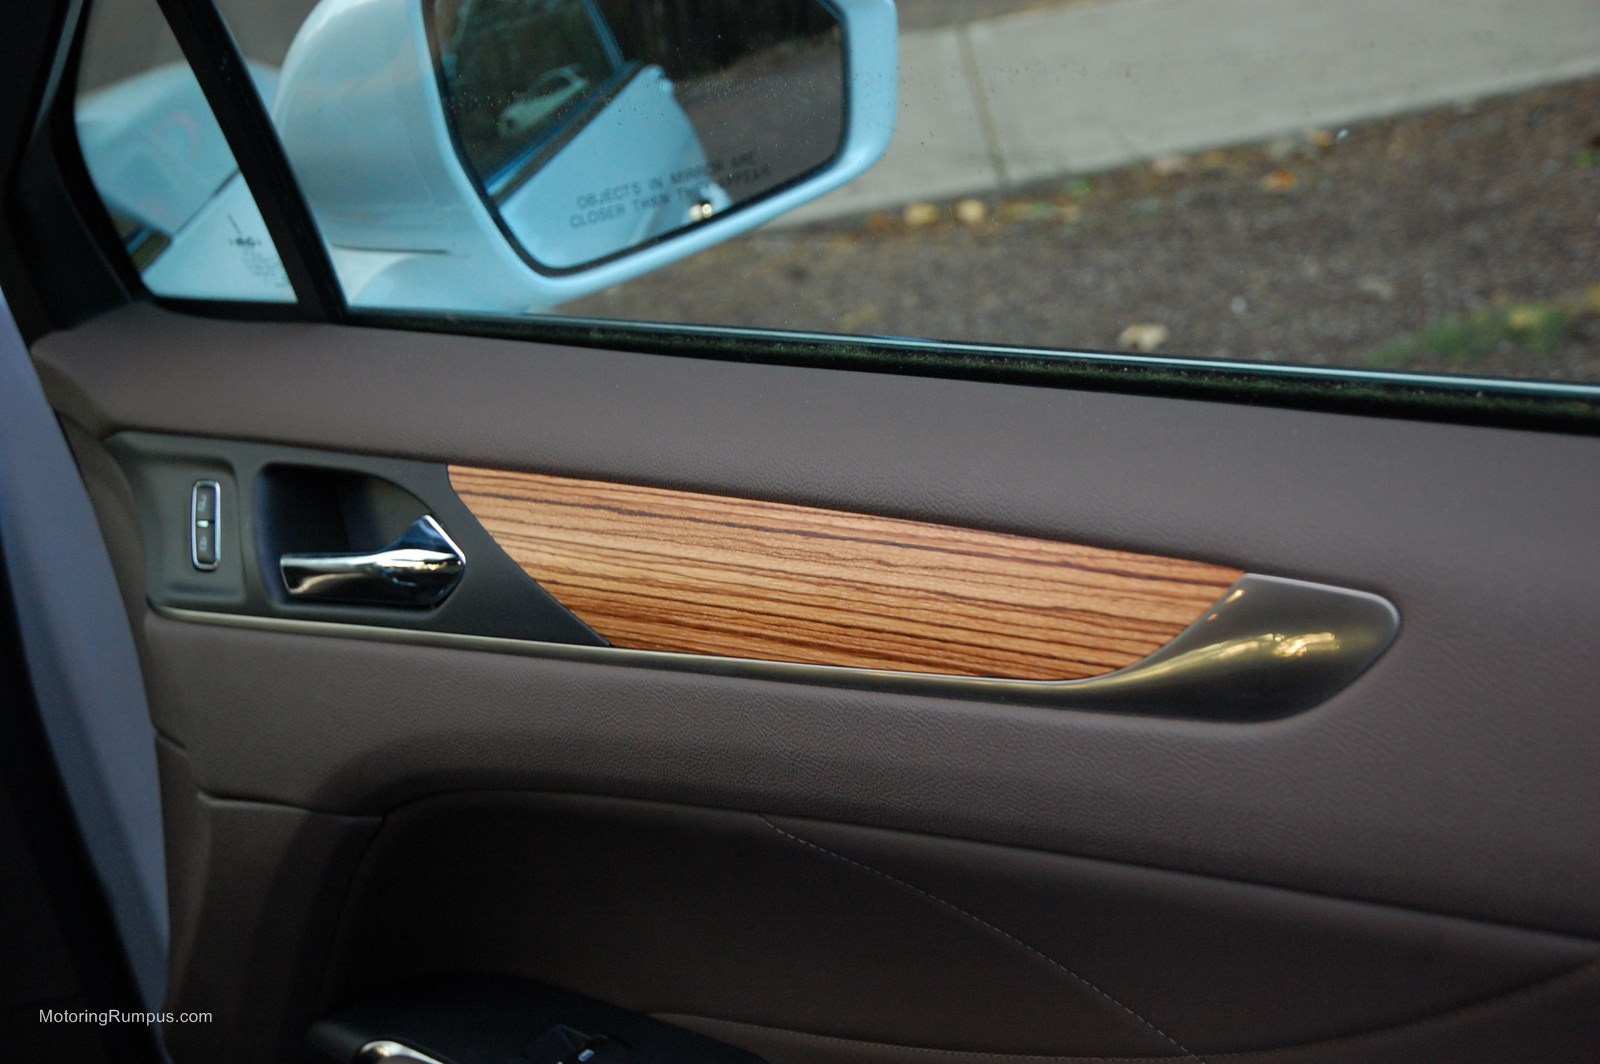 2015 Lincoln MKC Zebrano Wood Trim